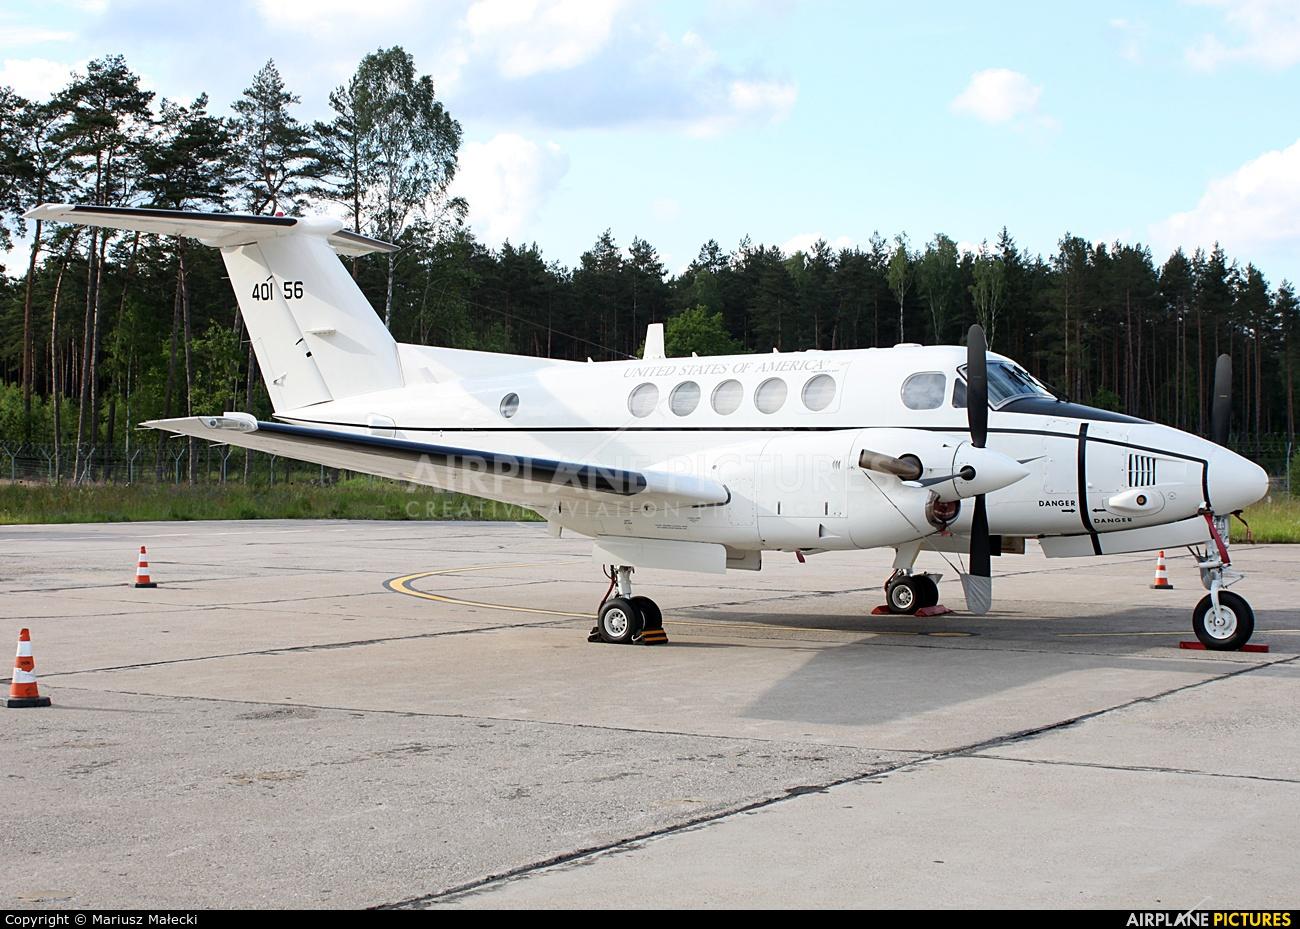 USA - Army 84-00156 aircraft at Olsztyn Mazury Airport (Szymany)